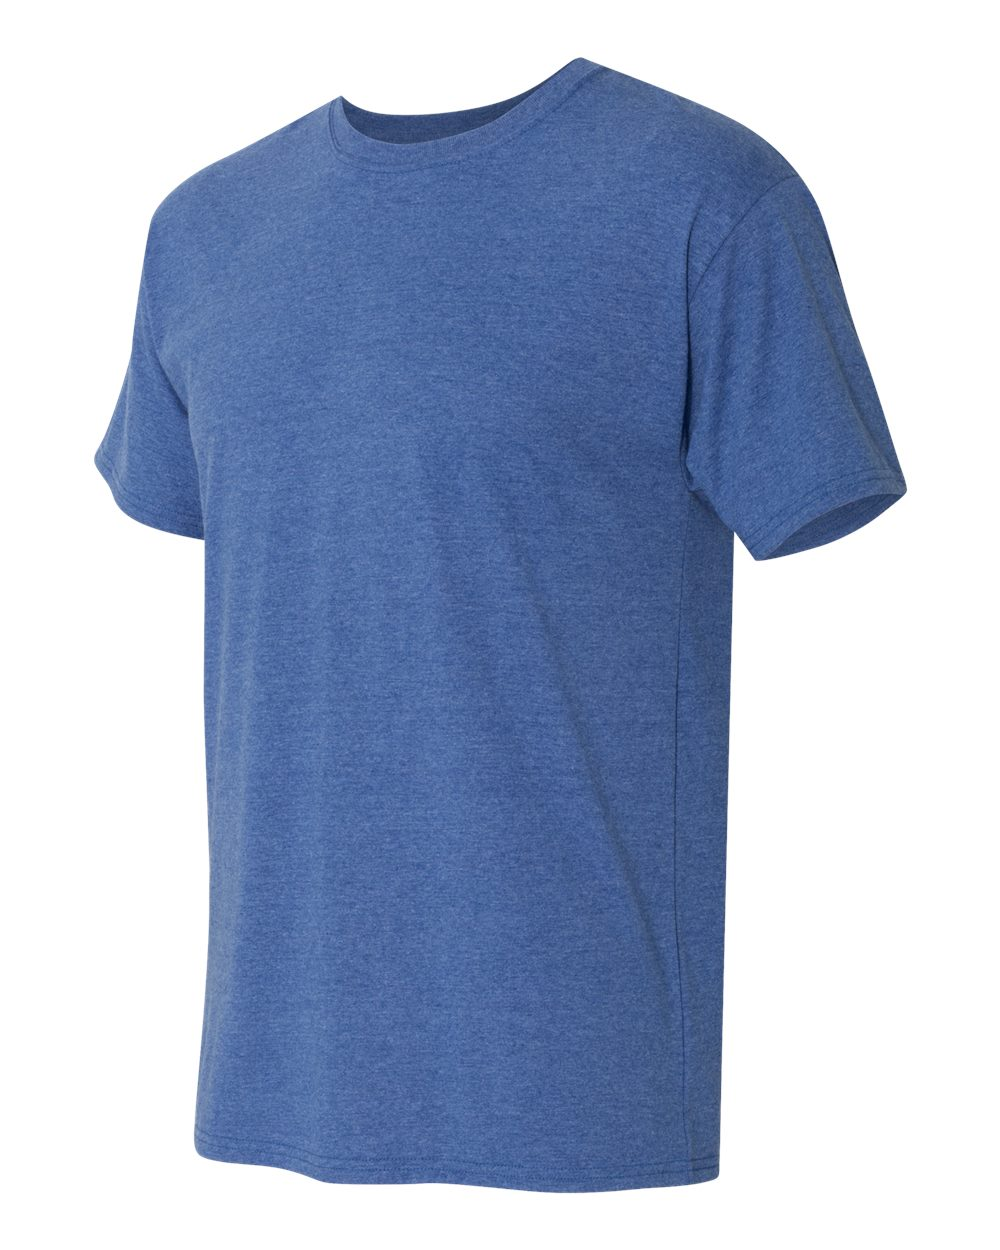 Hanes-Men-039-s-X-Temp-Triblend-T-Shirt-With-Fresh-Iq-42TB-S-3XL thumbnail 26